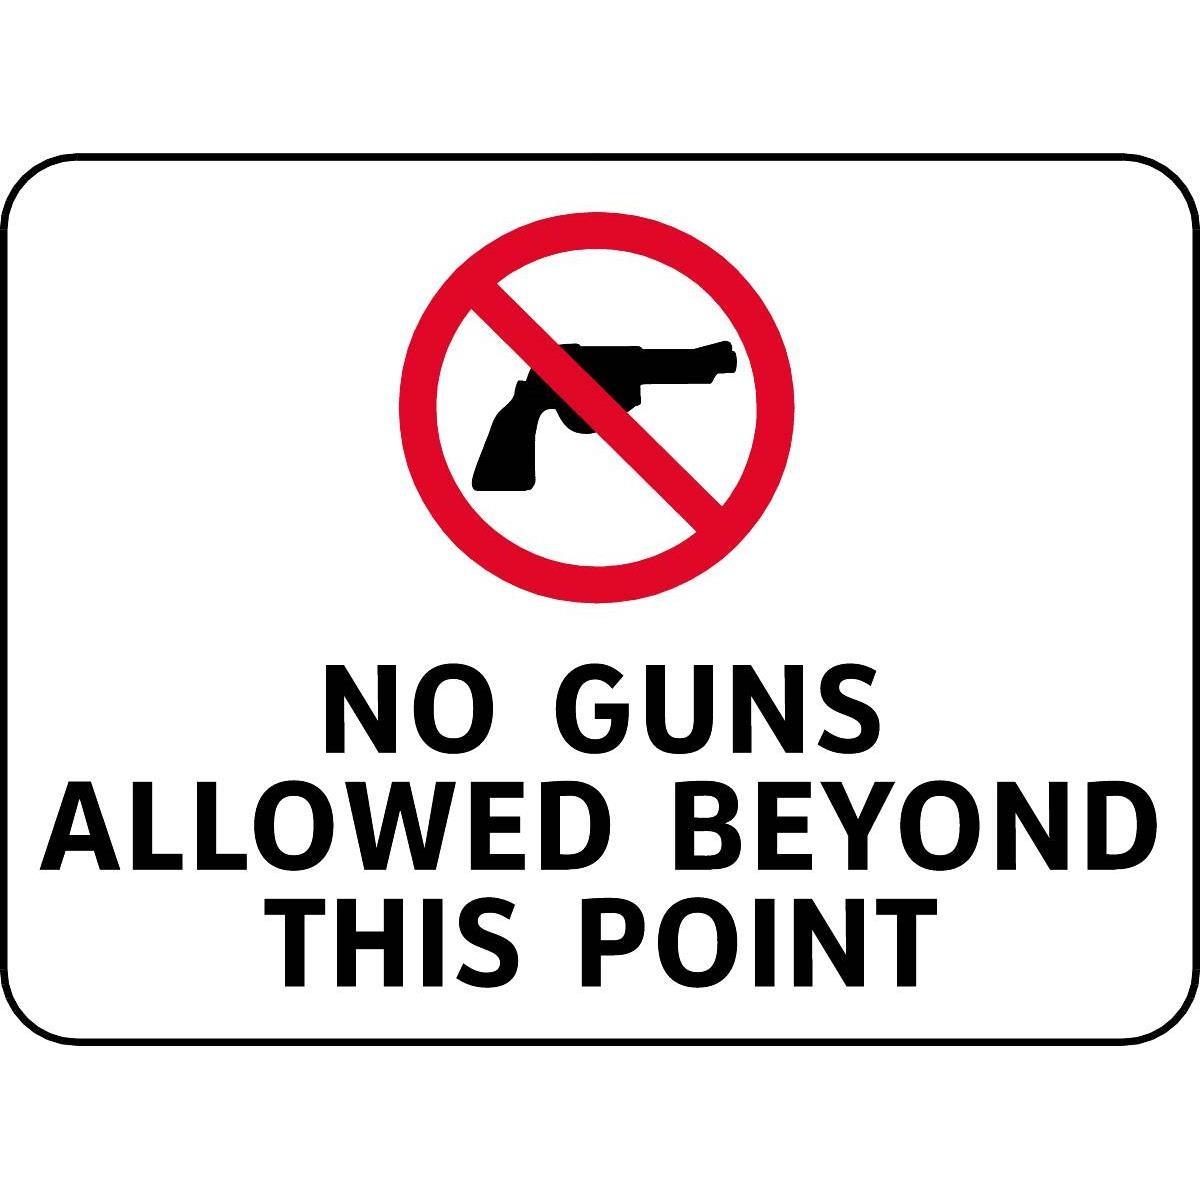 12 Best Photos Of No Gun Allowed Signage - Printable No Guns Allowed - Free Printable No Guns Allowed Sign